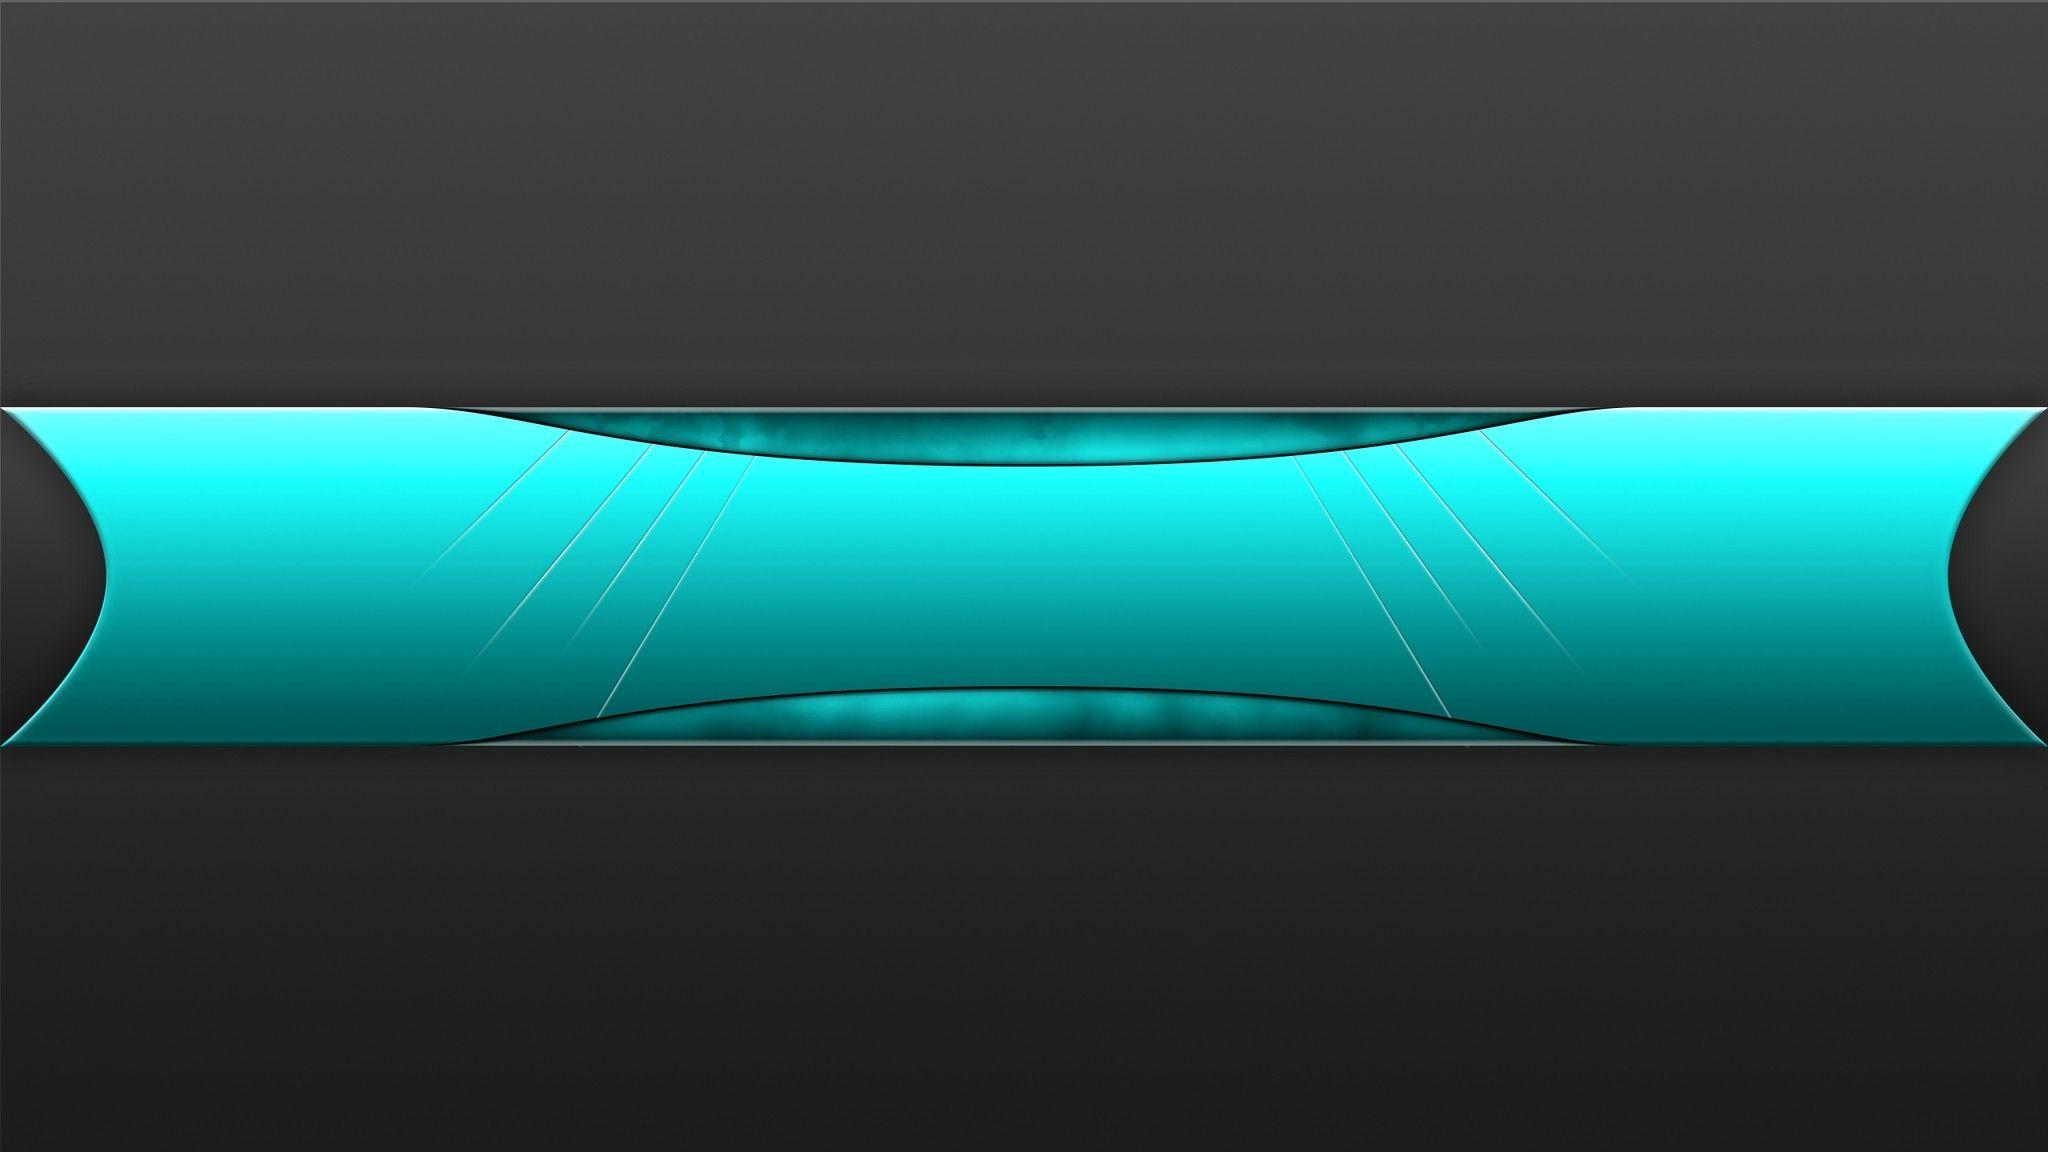 2048x1152 free youtube banner templates helmar designs. Black Bedroom Furniture Sets. Home Design Ideas